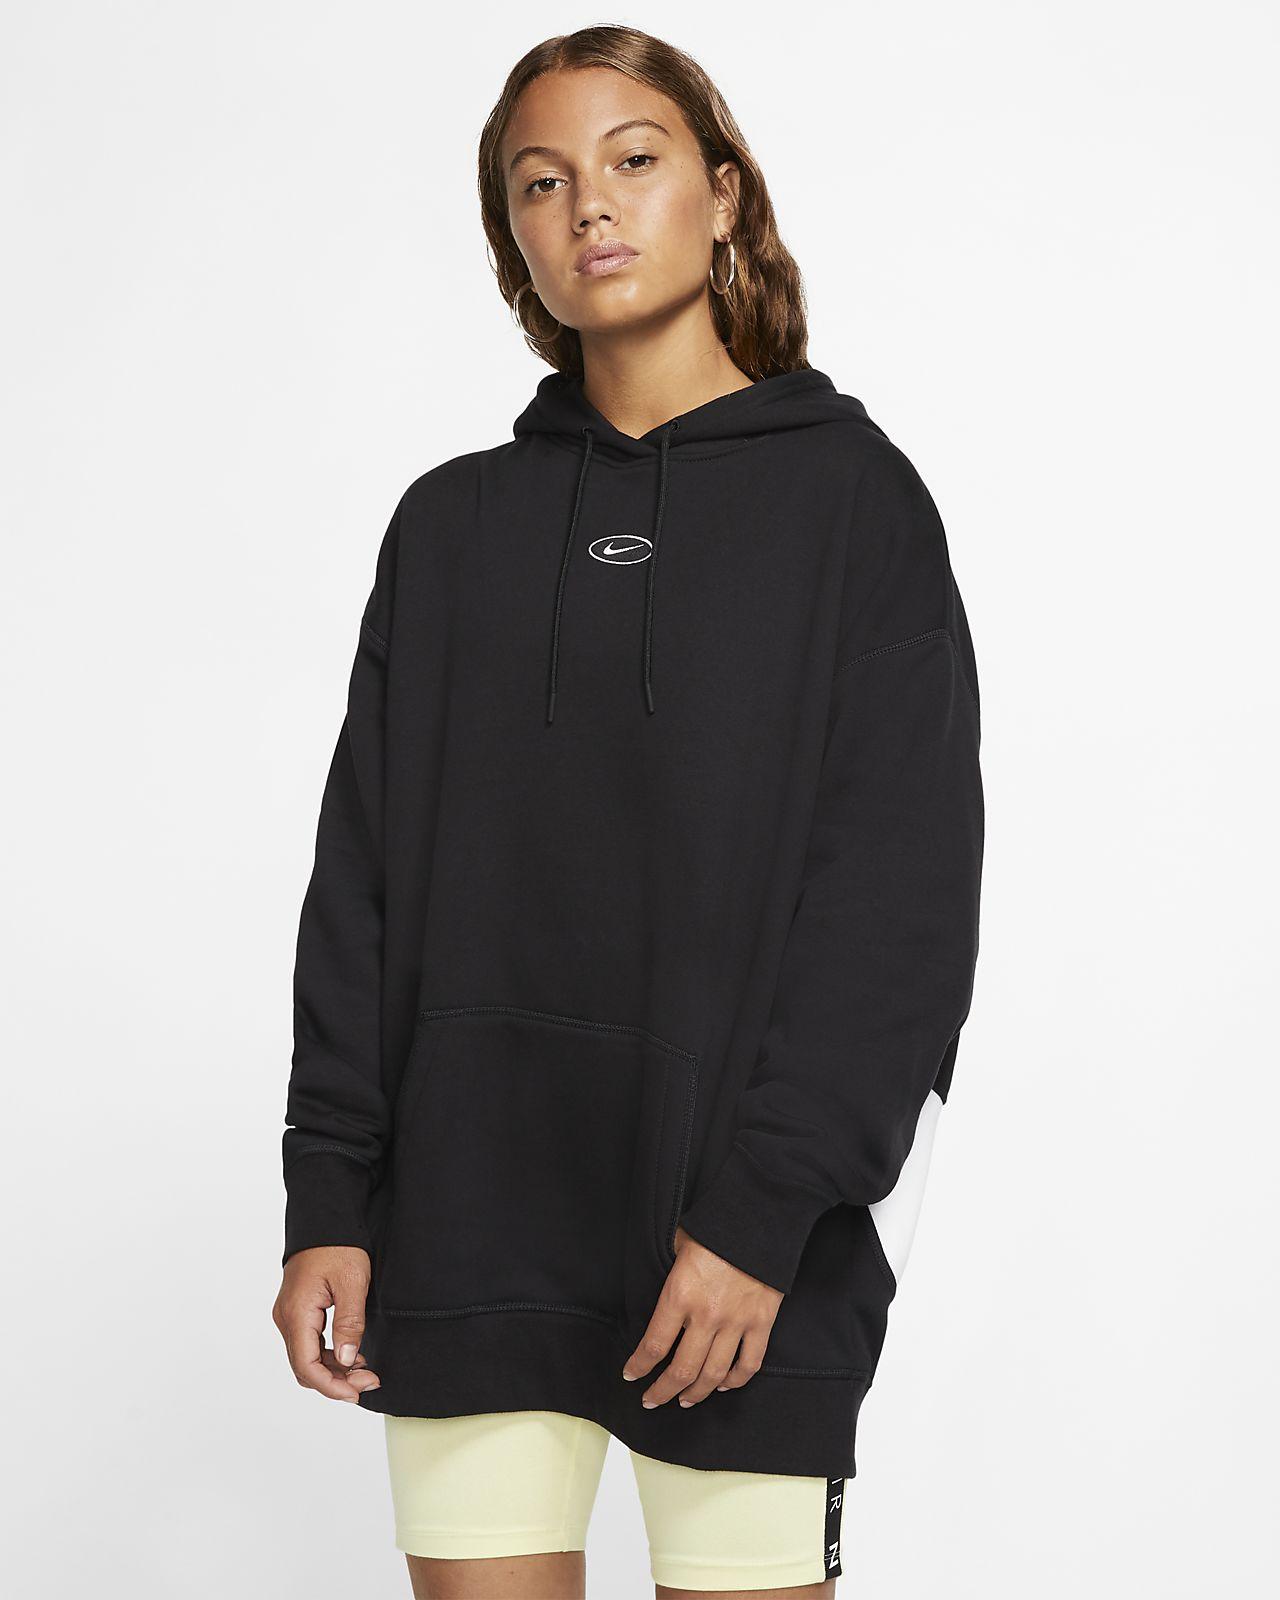 sweat-shirt nike femme